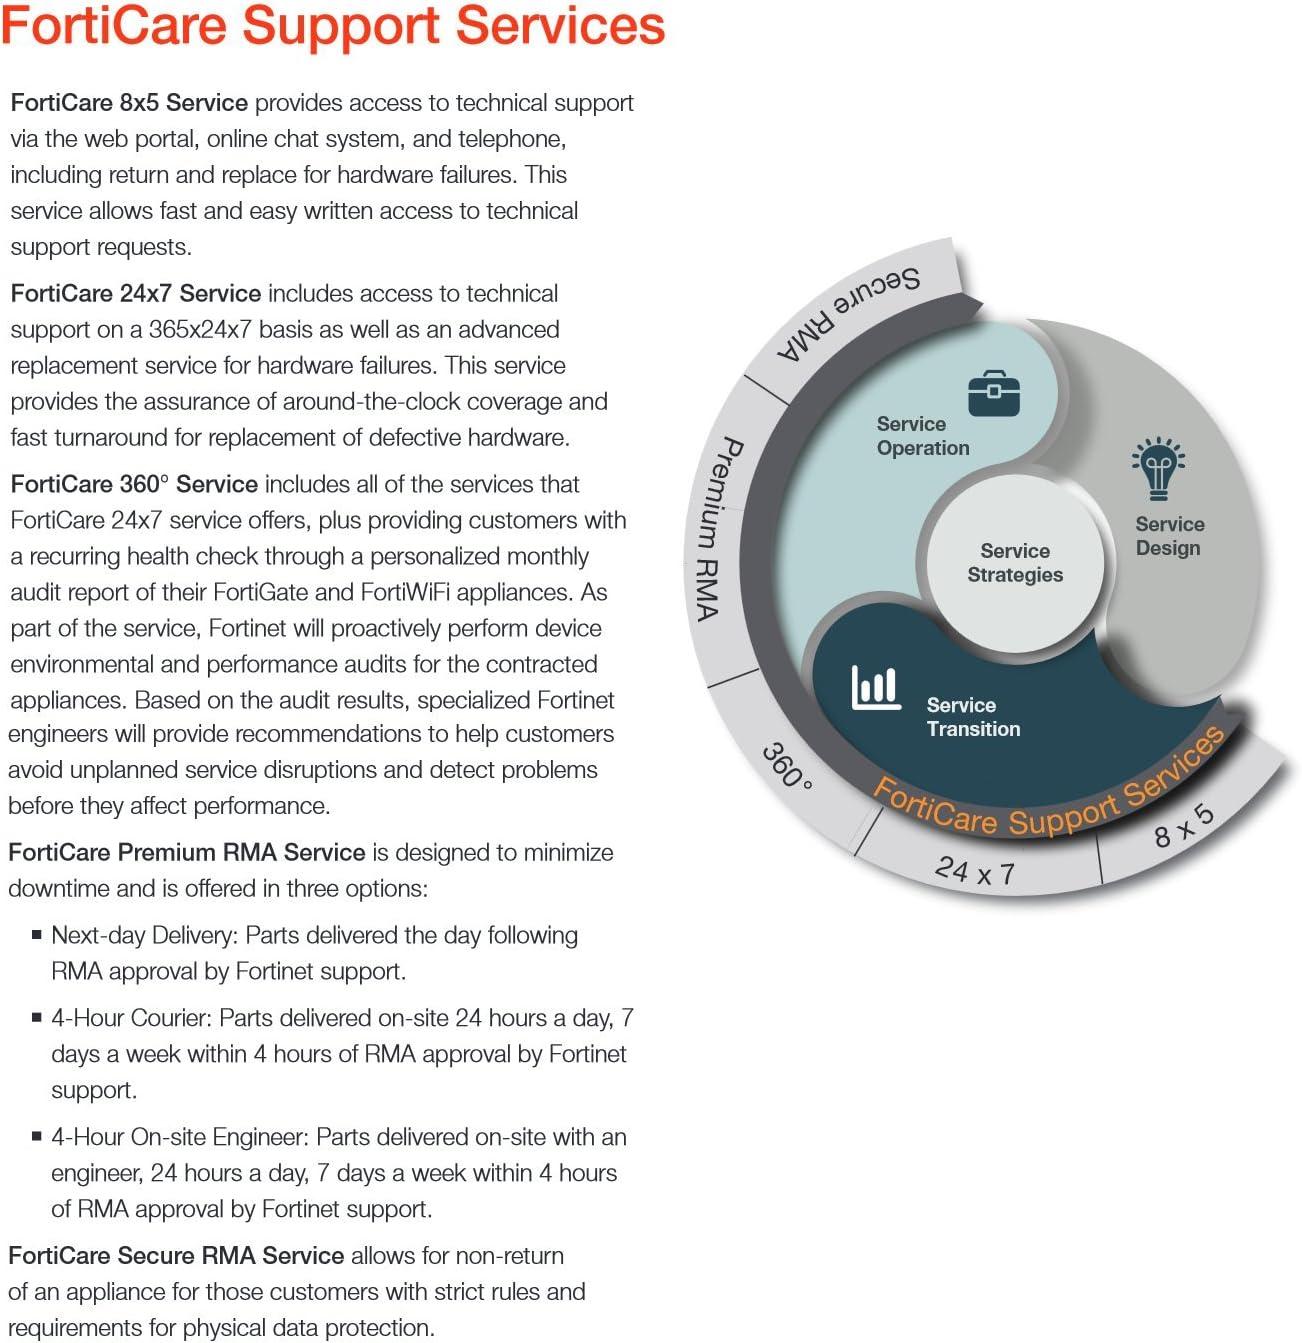 Fortinet FortiVoice Enterprise-20E4 License 1 YR 24x7 FortiCare FC-10-FVE21-247-02-12